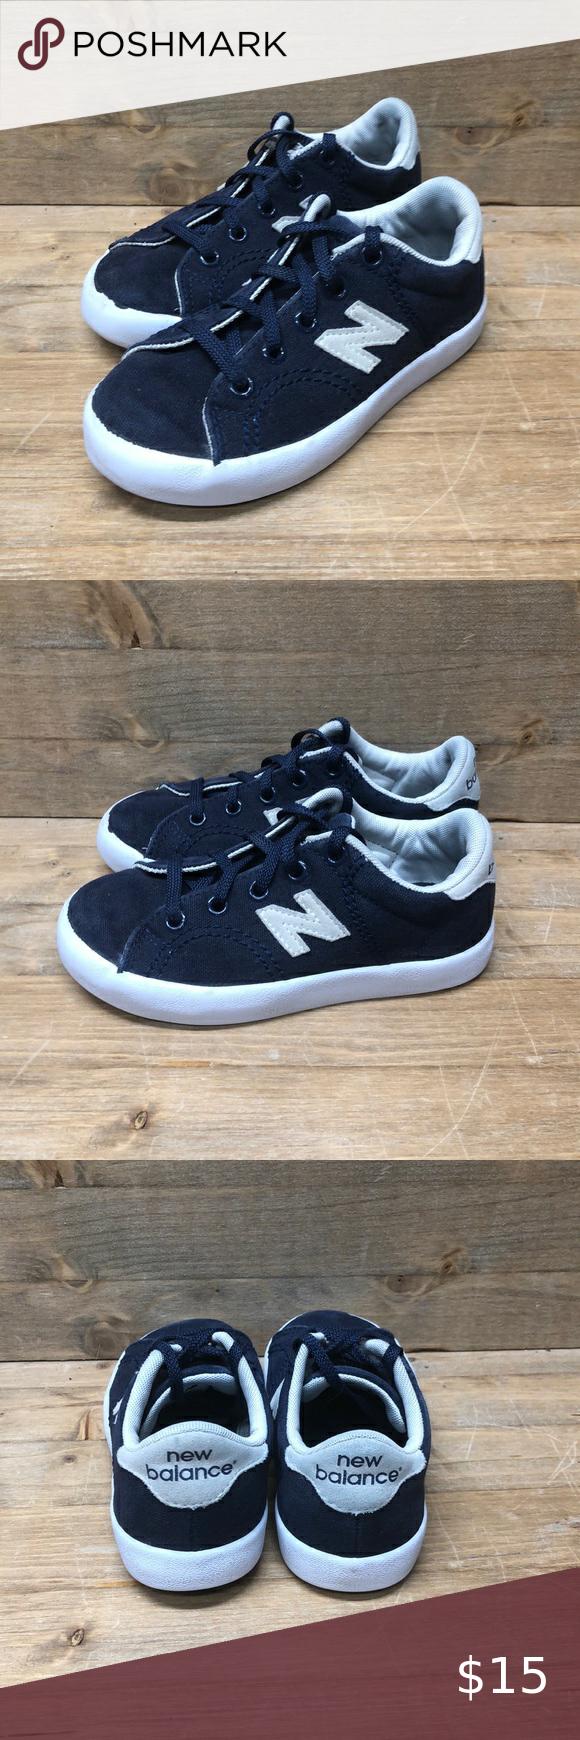 New Balance Boys Size 11 Sneaker in